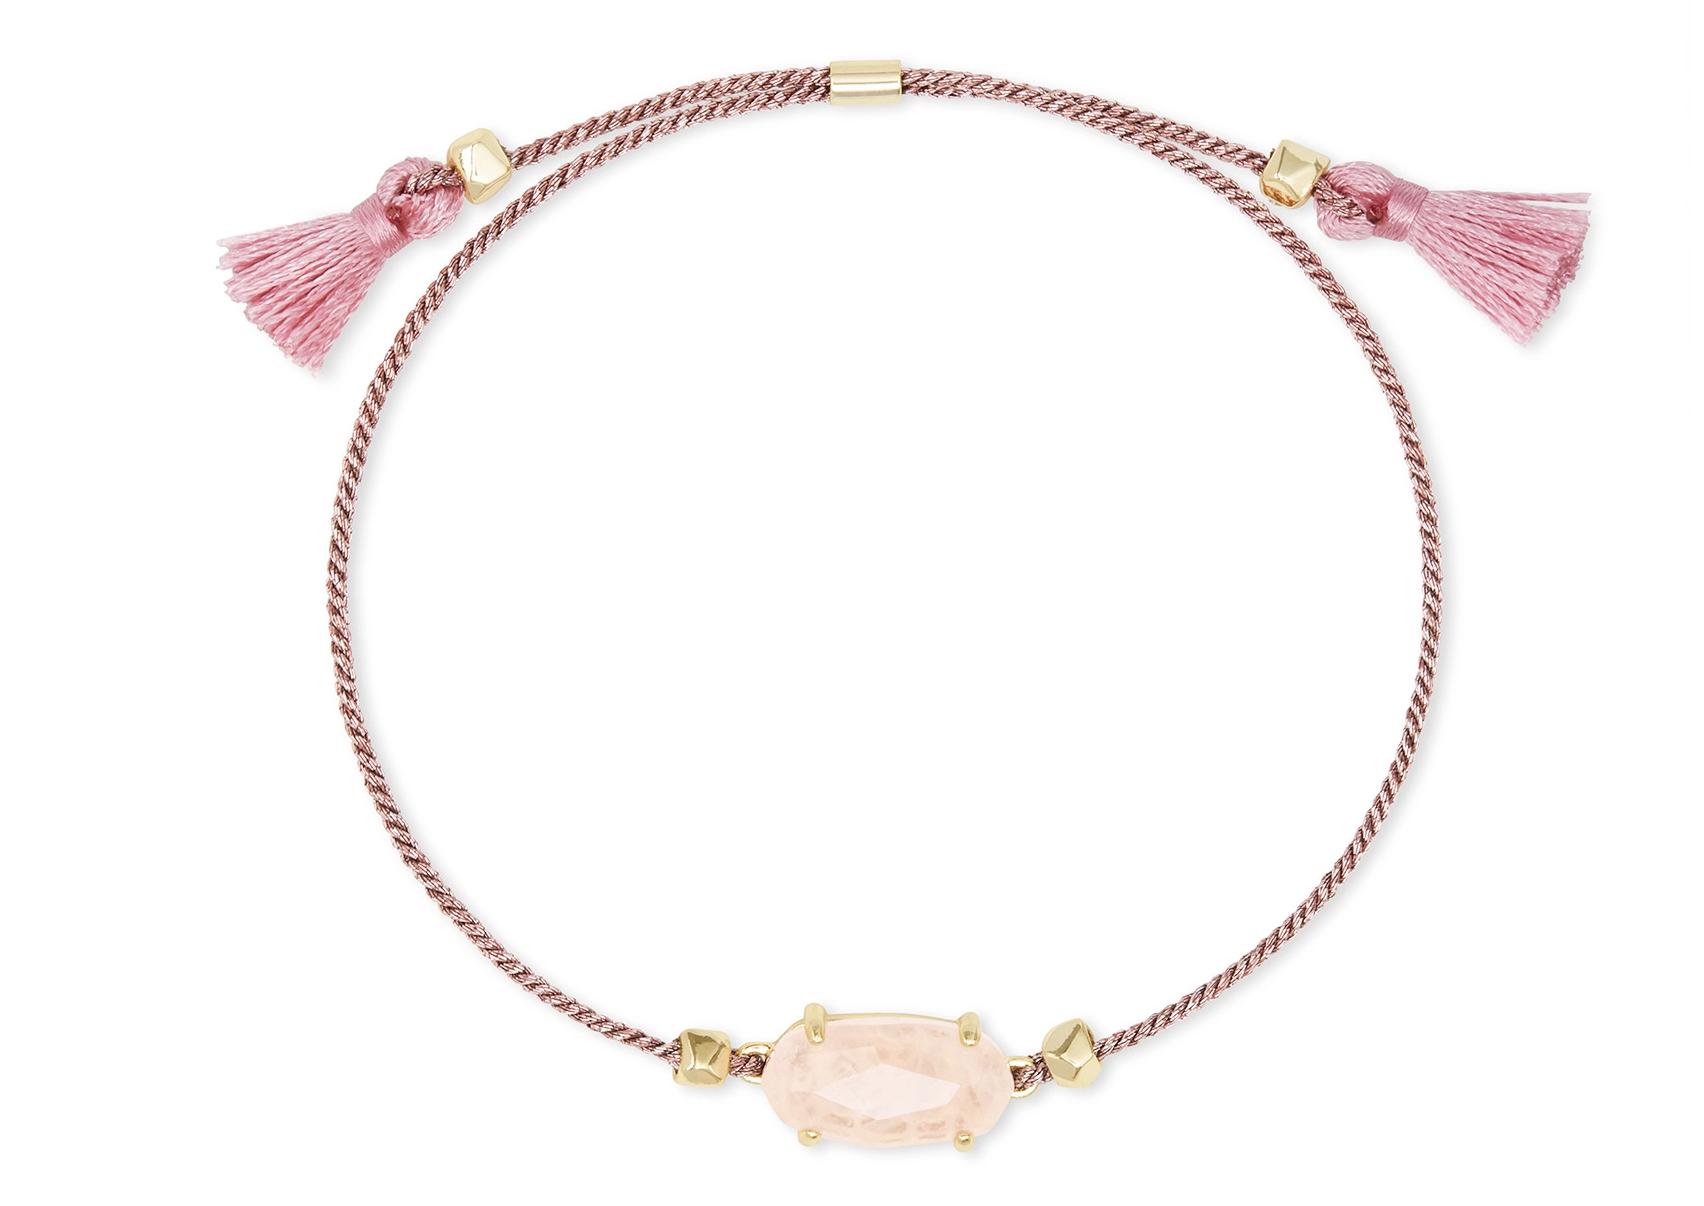 kendra scott charity bracelet, giving tuesday gift